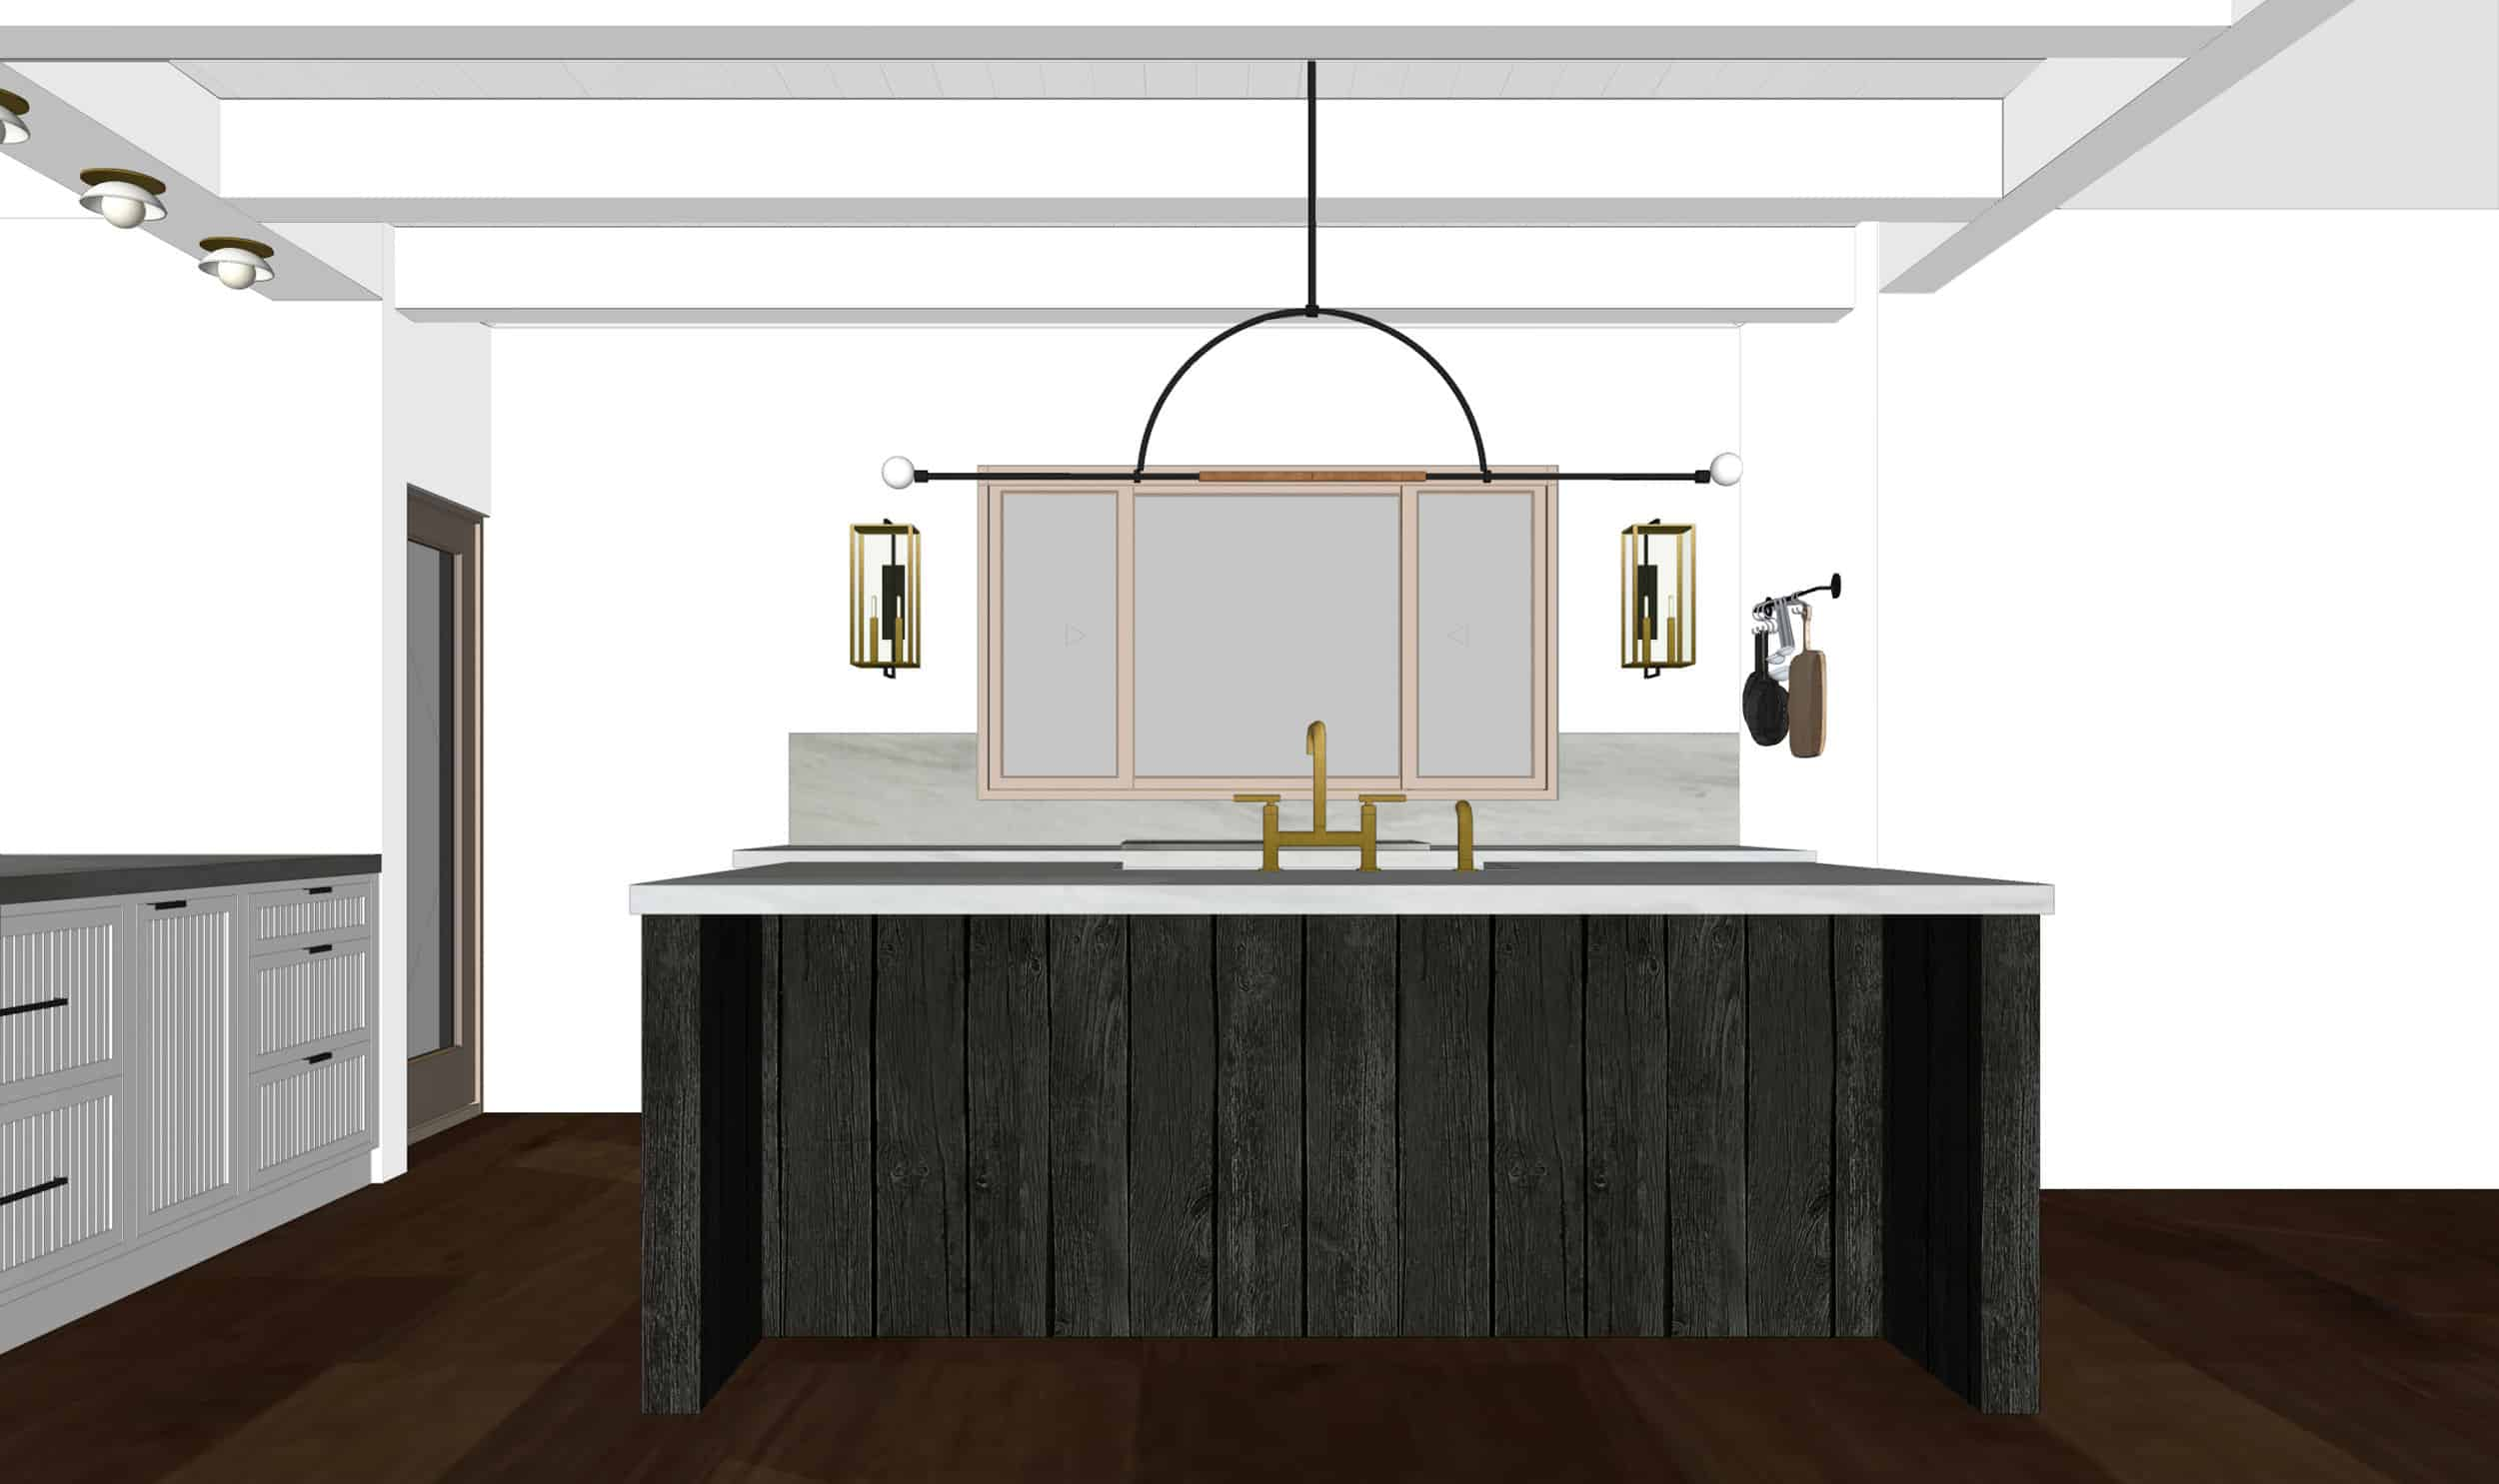 Emily Henderson Mountain Fixer Upper I Design You Decide Kitchen Render 07 Fnladj